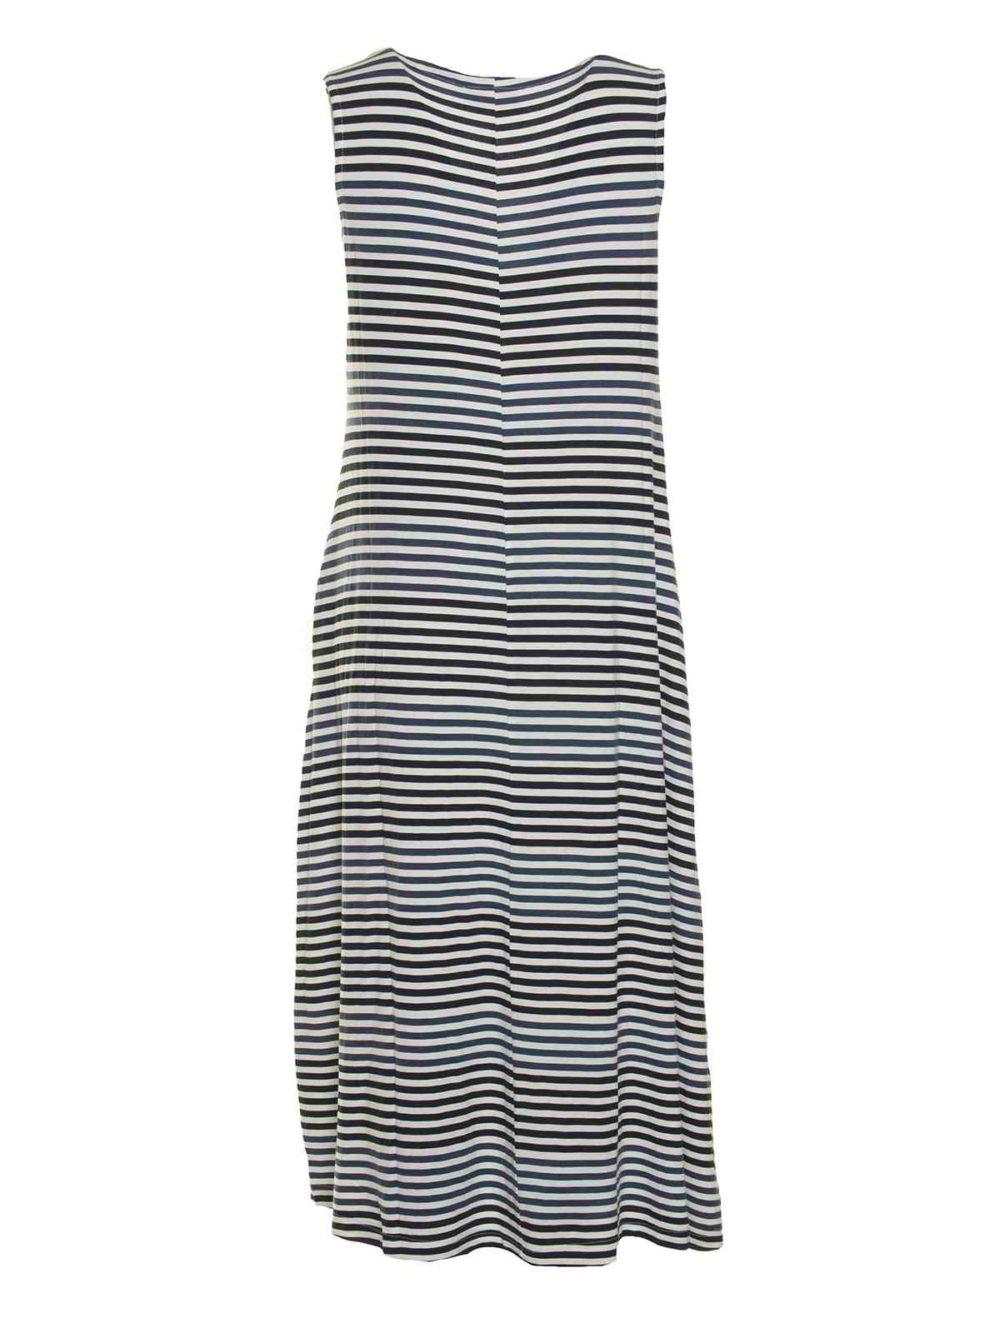 Dress PSA-9056 Capri Katie Kerr Women's Clothing